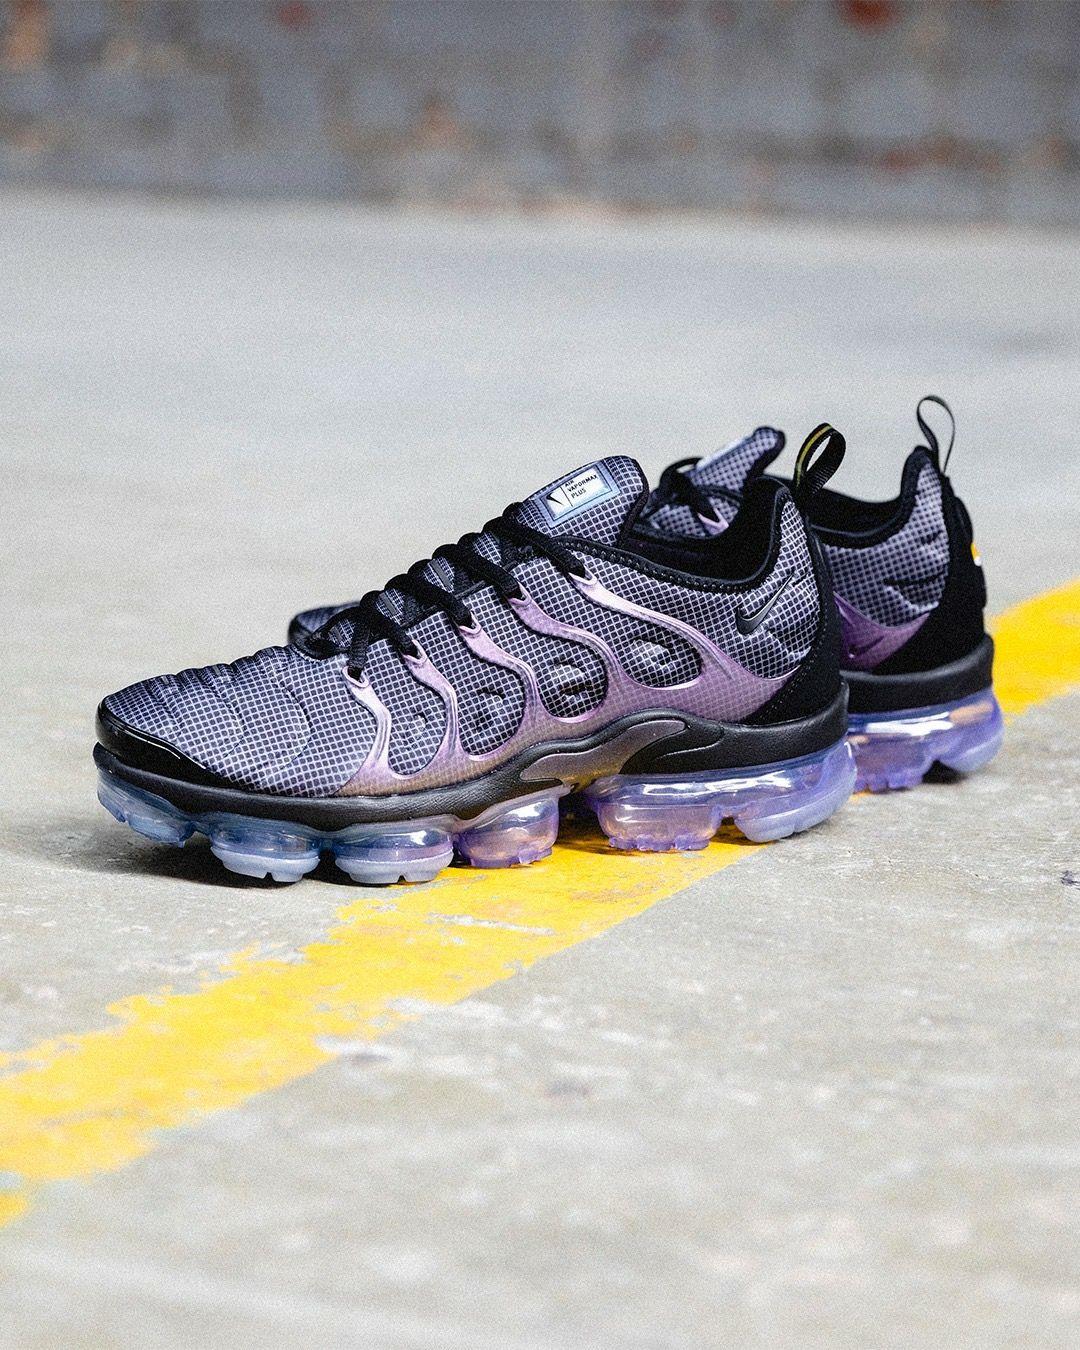 huge discount 65409 f4224 Nike Air Vapormax Plus | FEET FIRST in 2019 | Sneakers nike ...